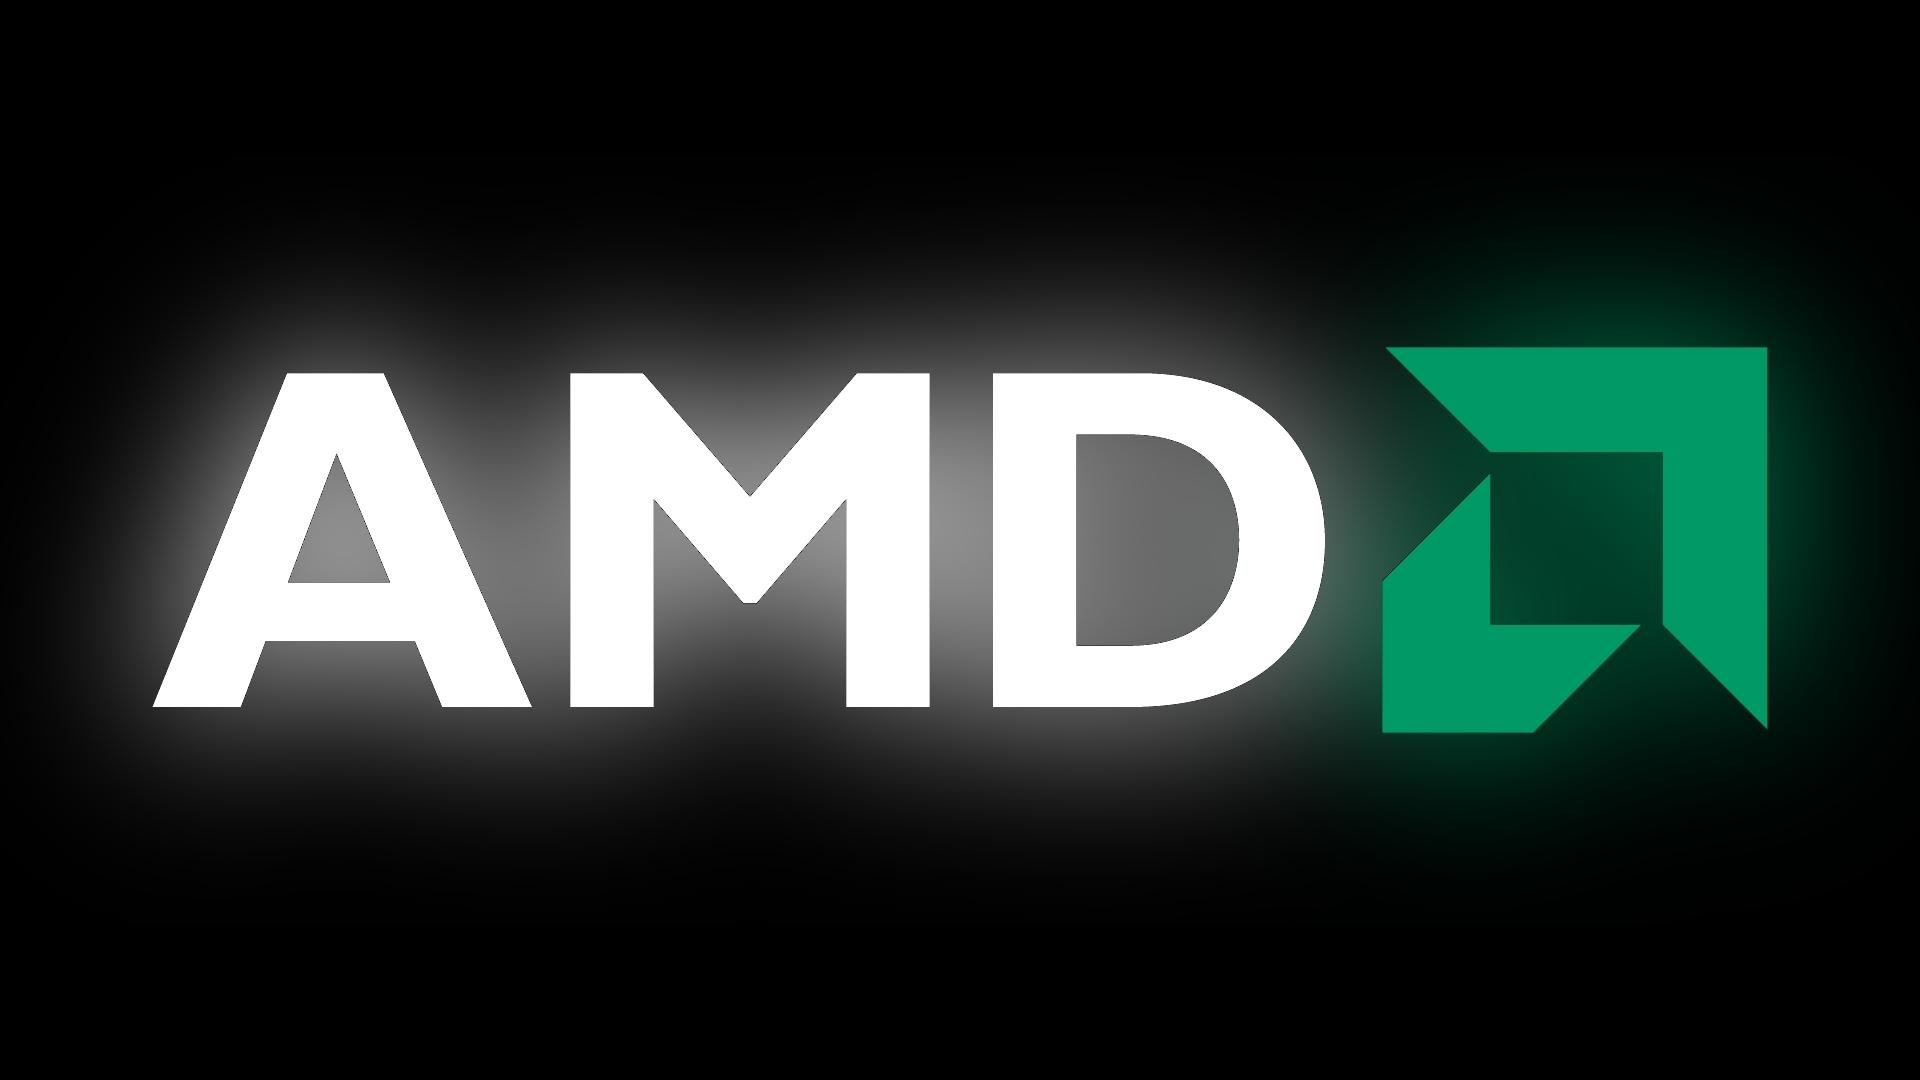 Amd HD wallpapers, Desktop wallpaper - most viewed